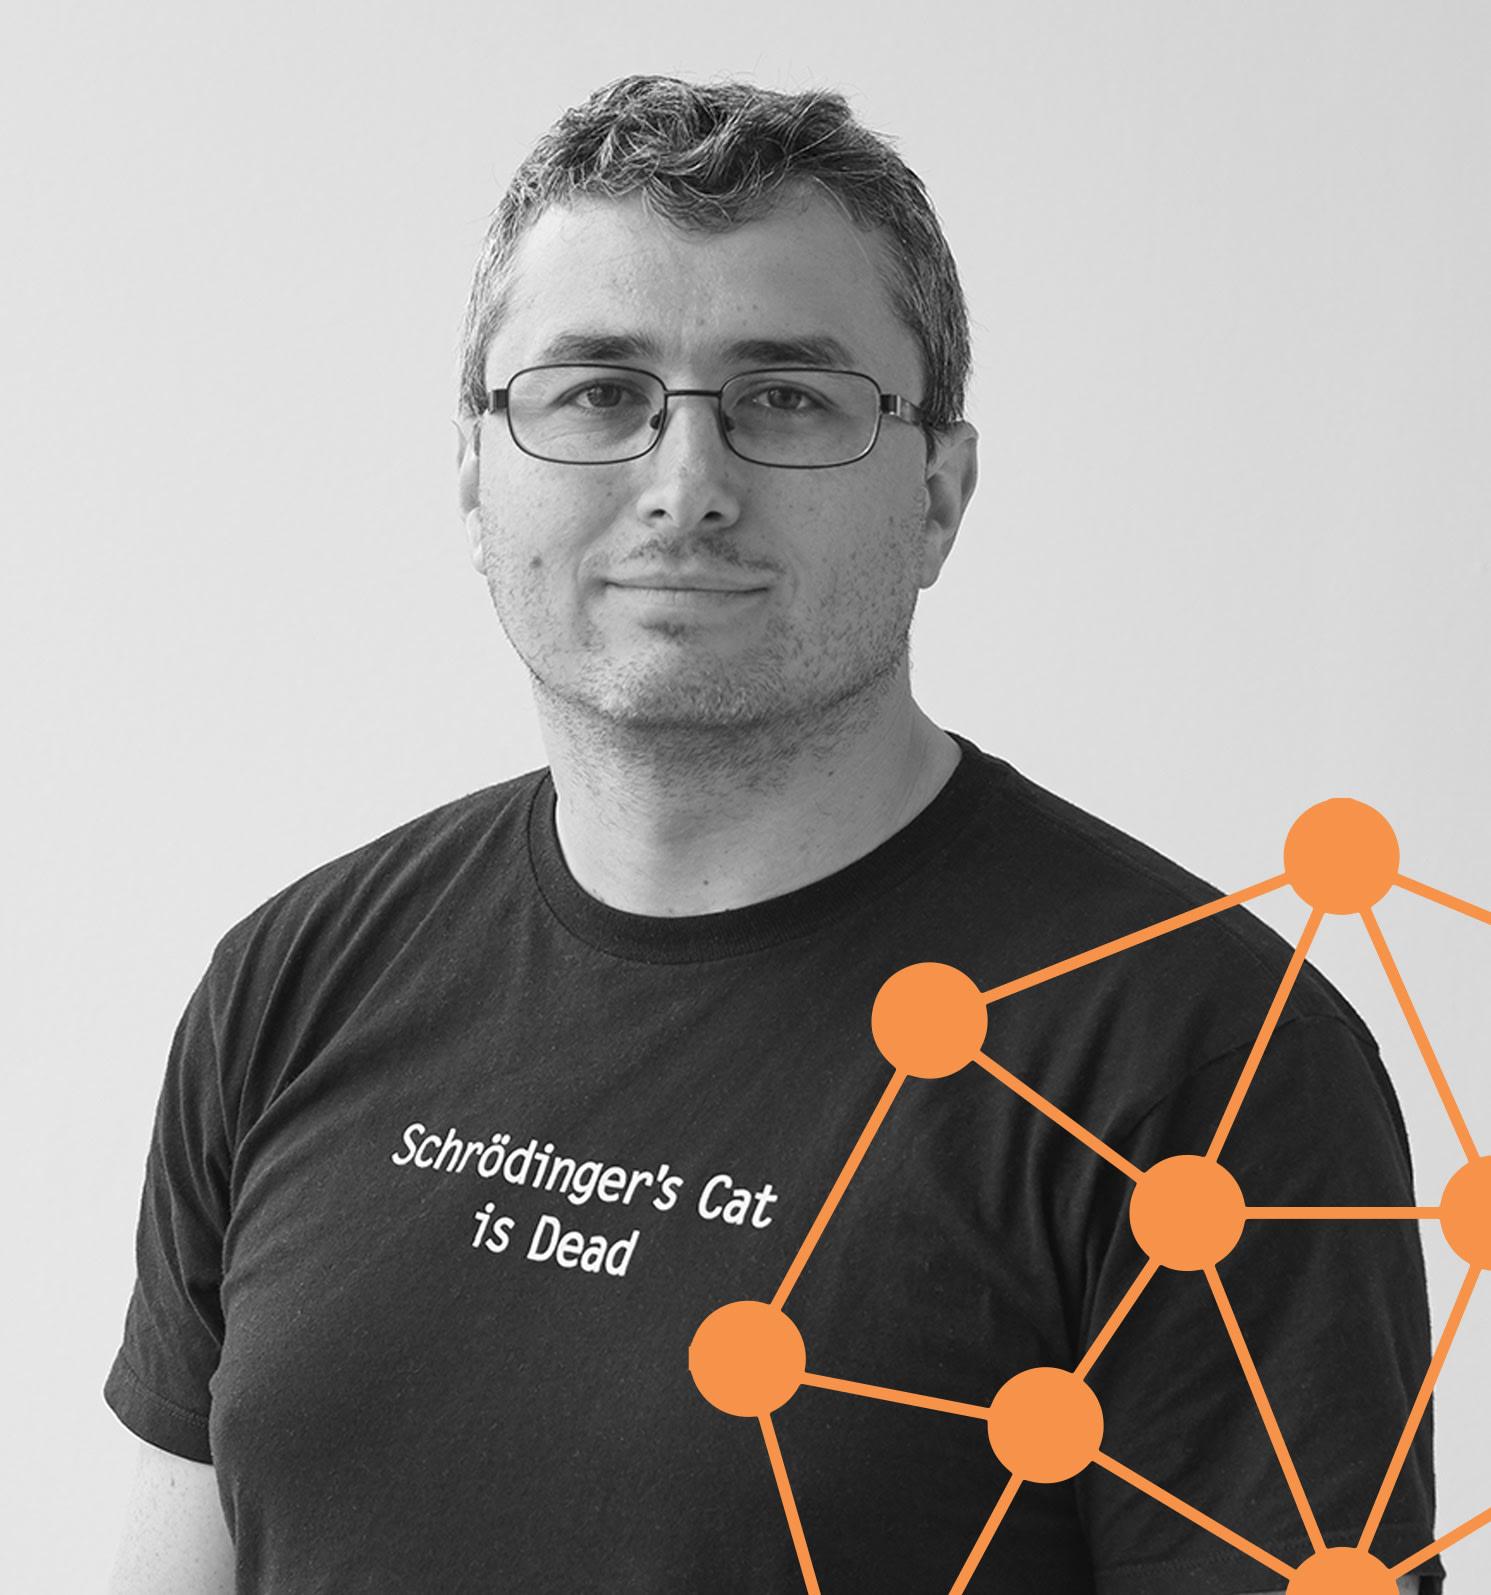 Diego_Díaz_bn_logo